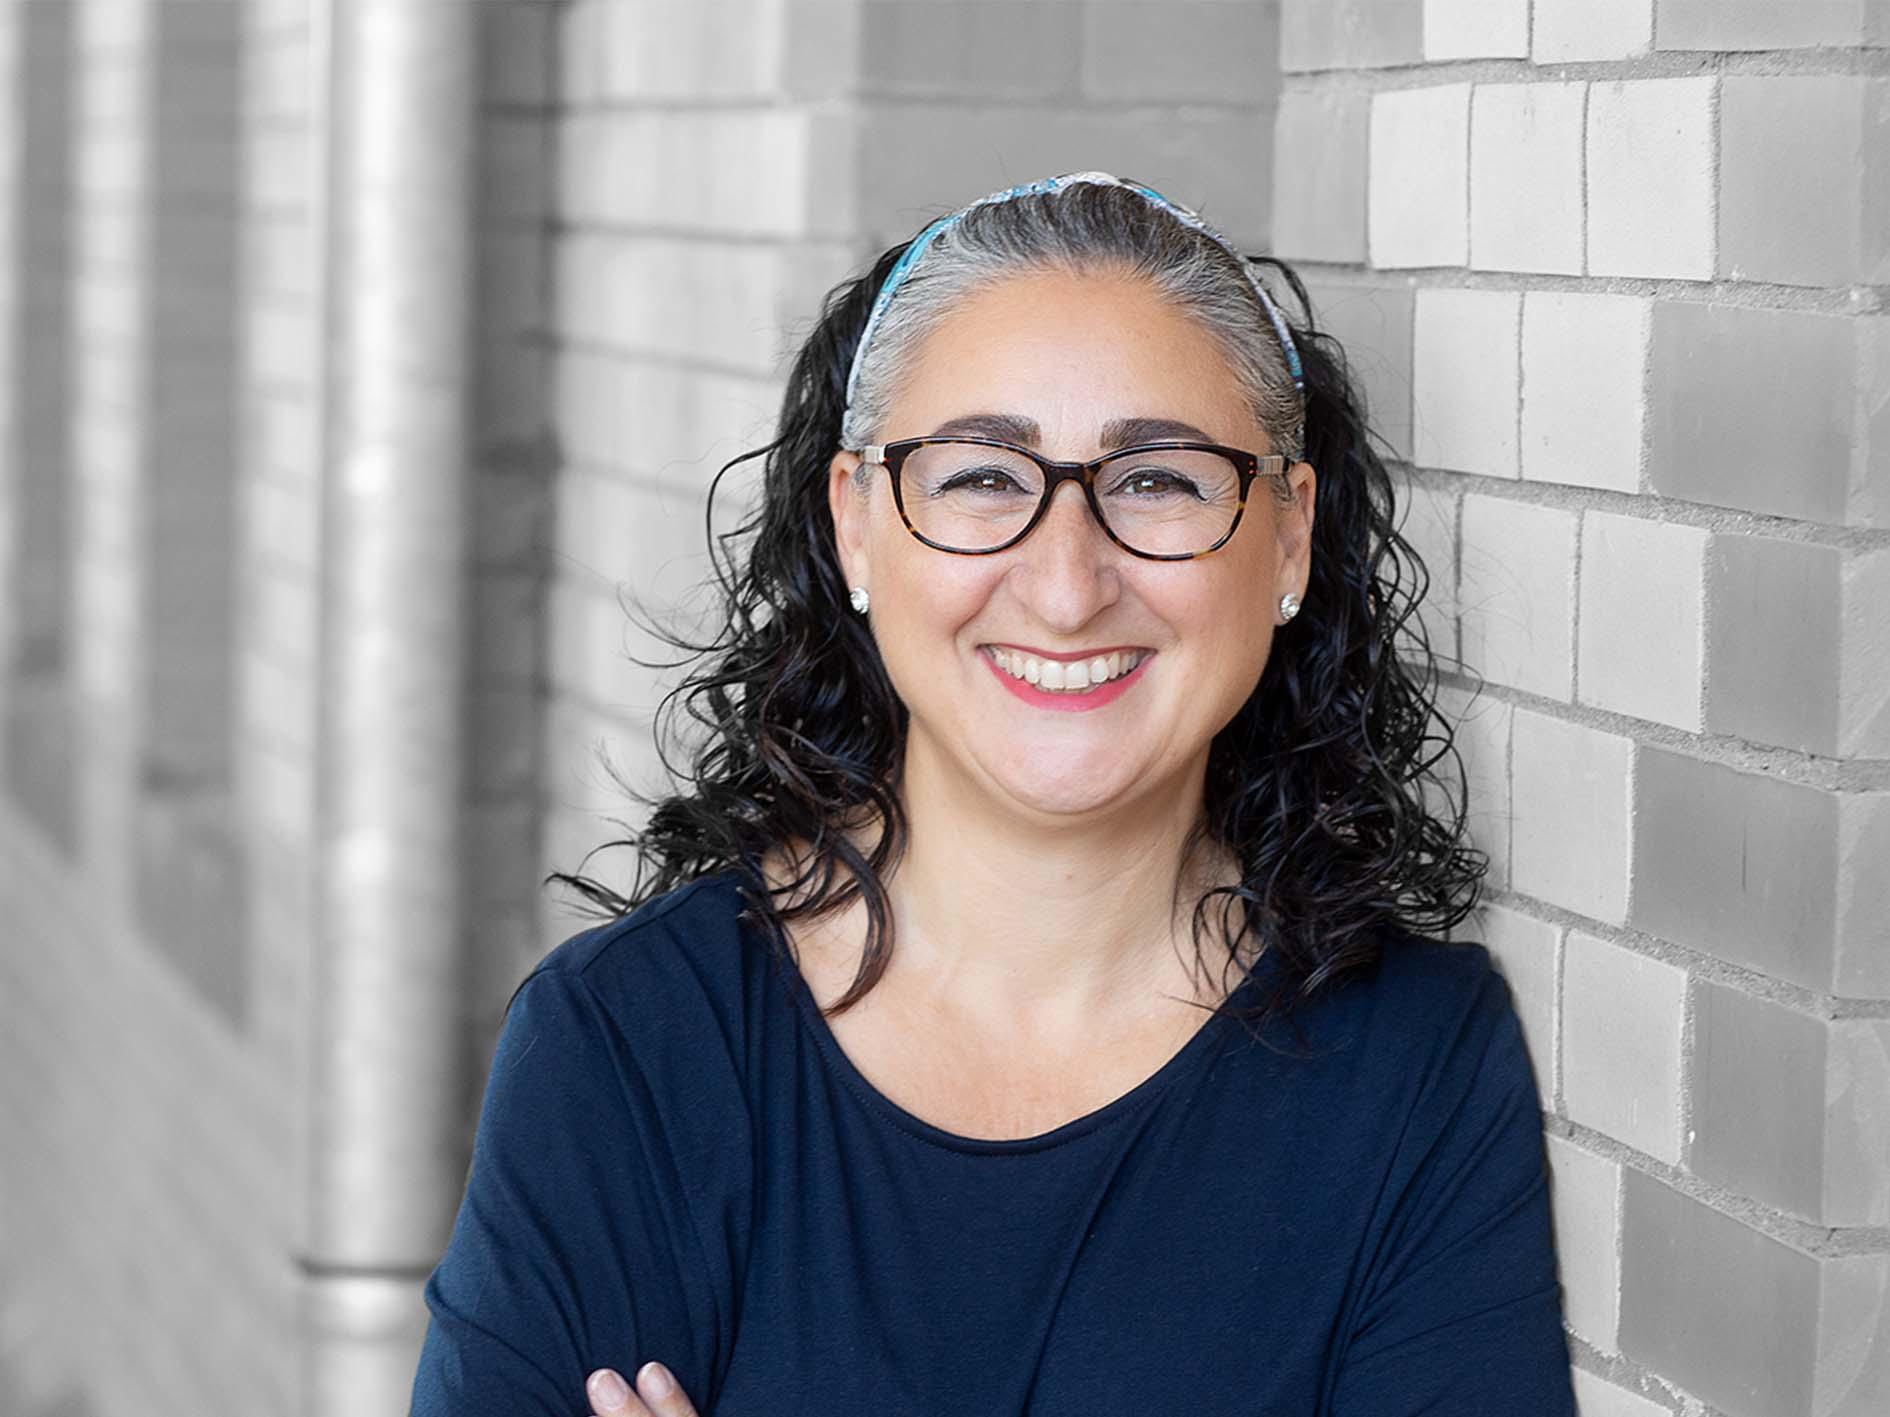 Daniela Sonnenfeld